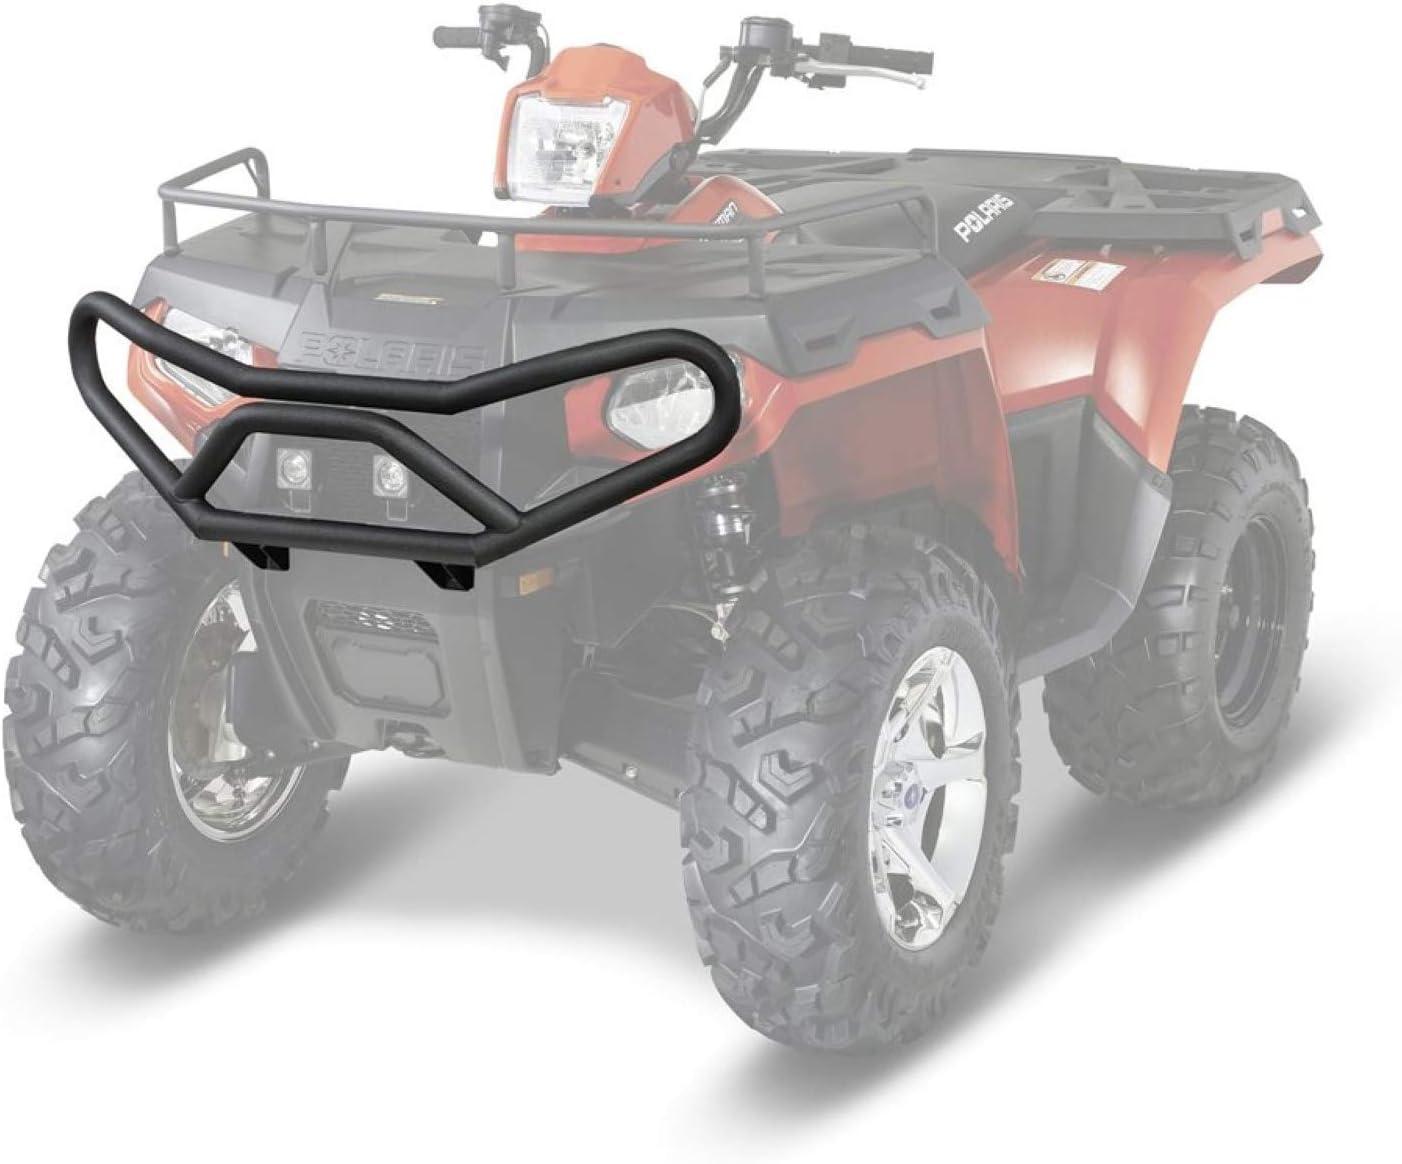 Quad ATV Bison Front Bumper Brush Guard Trail Series Polaris Sportsman 400 500 800 2011-2014